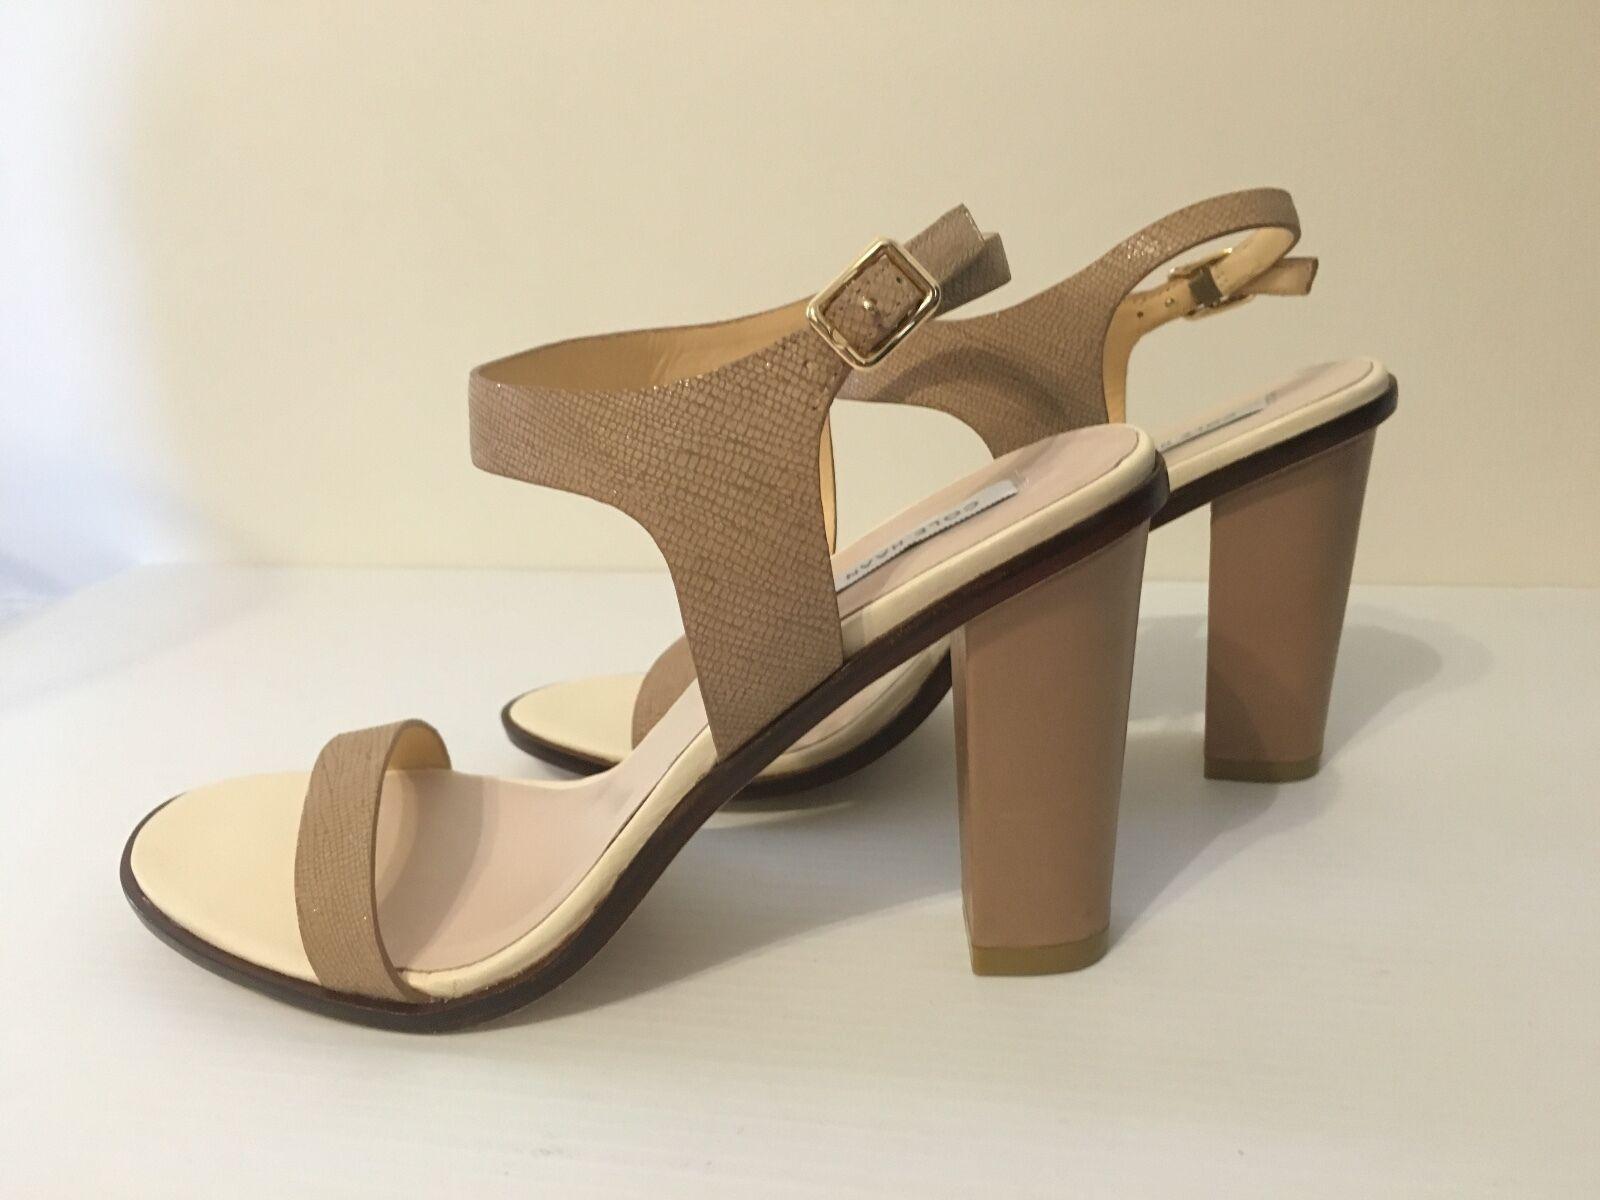 Cole Haan Cambon High Sandal D43909 Farbe    SHW LIZRD PRNT (Größe 6.5B, 6B, 9B) 43a46b